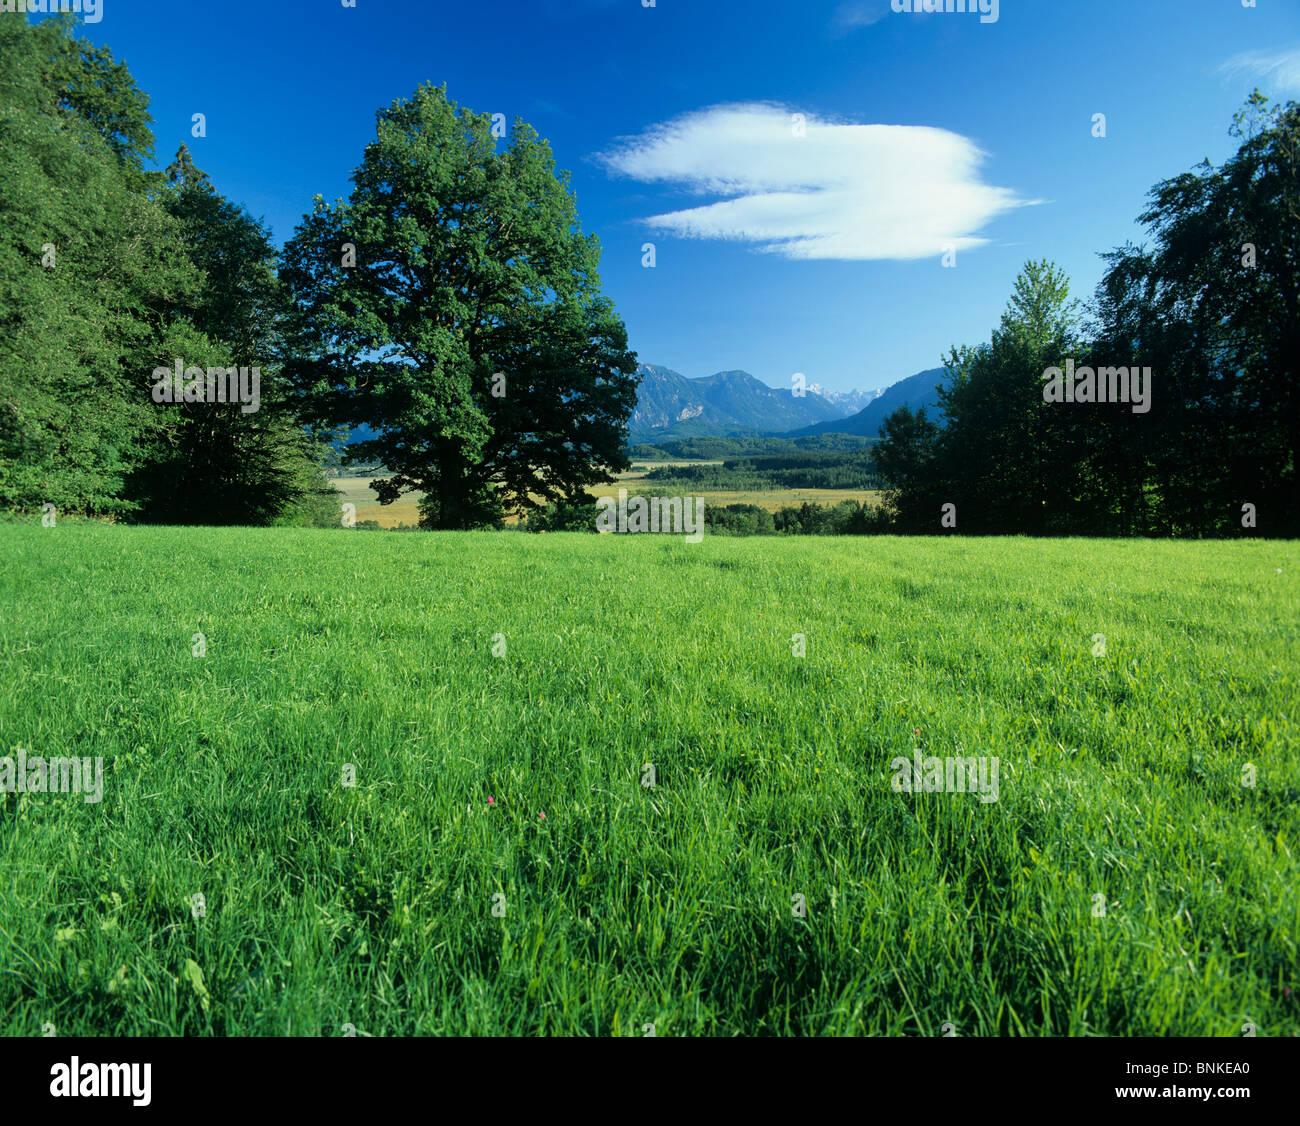 germany murnauer moss nature plants trees meadow field green scenery